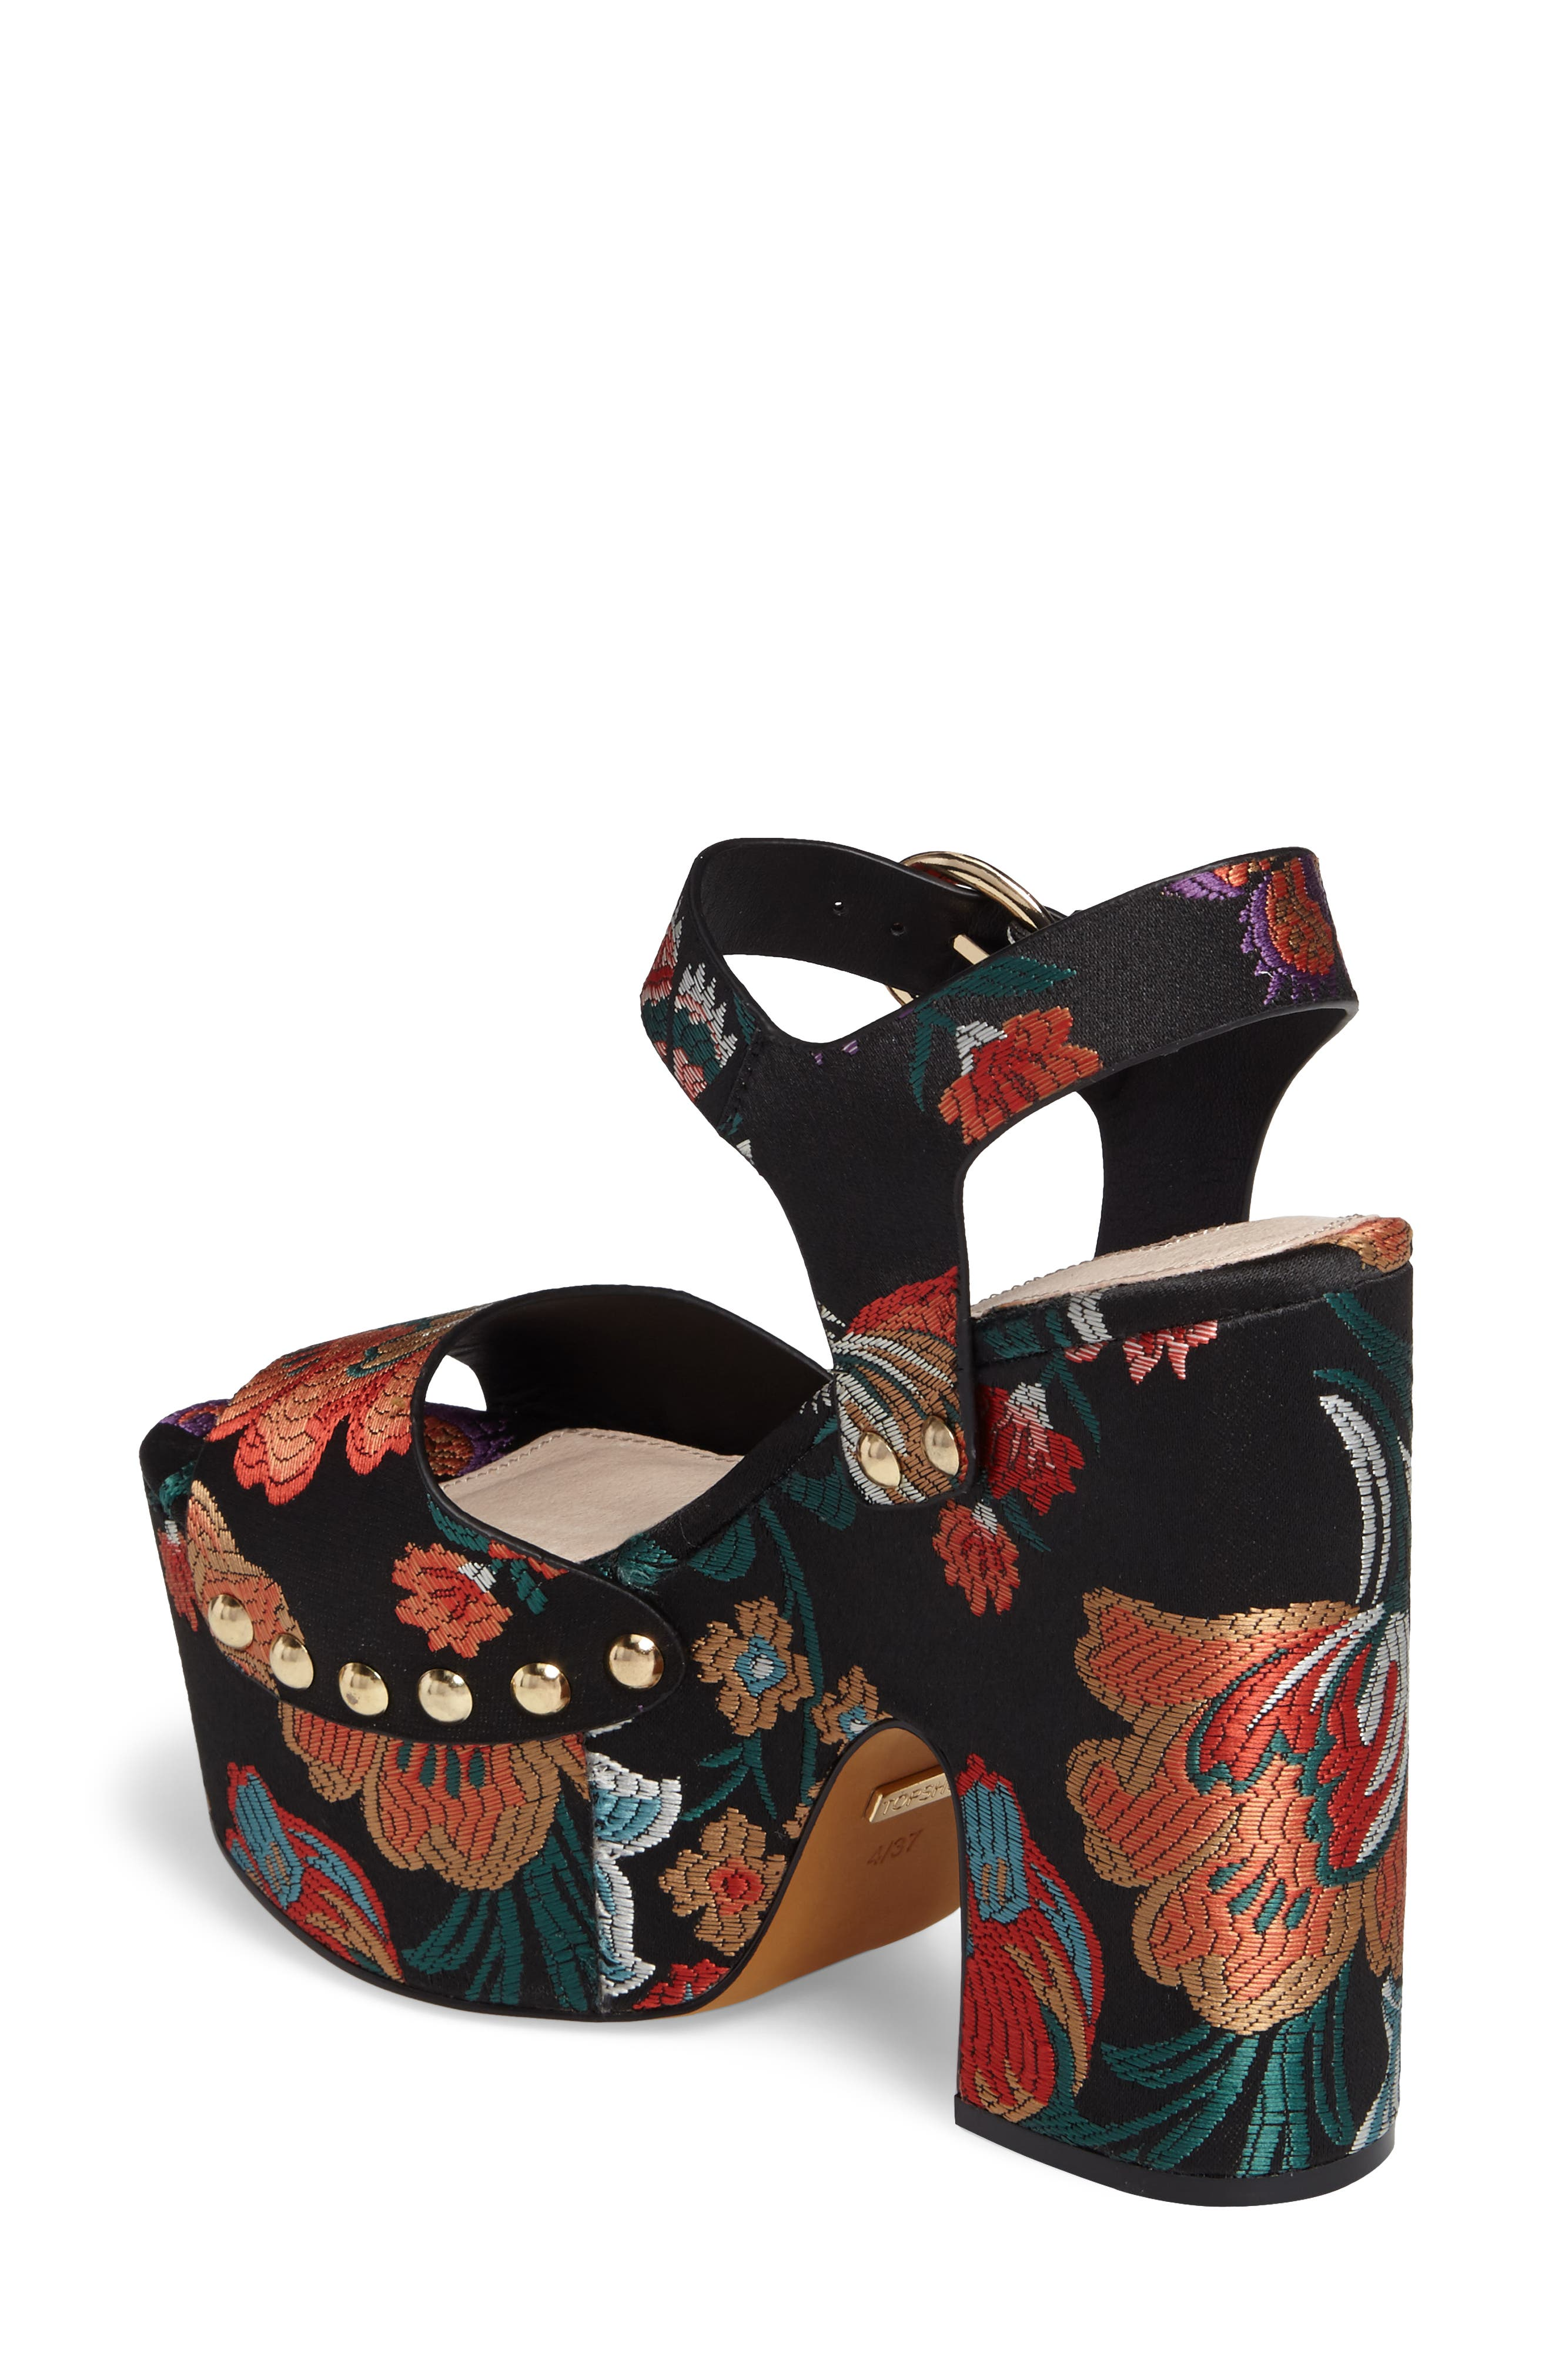 Lourdes Embroidered Platform Sandal,                             Alternate thumbnail 2, color,                             001